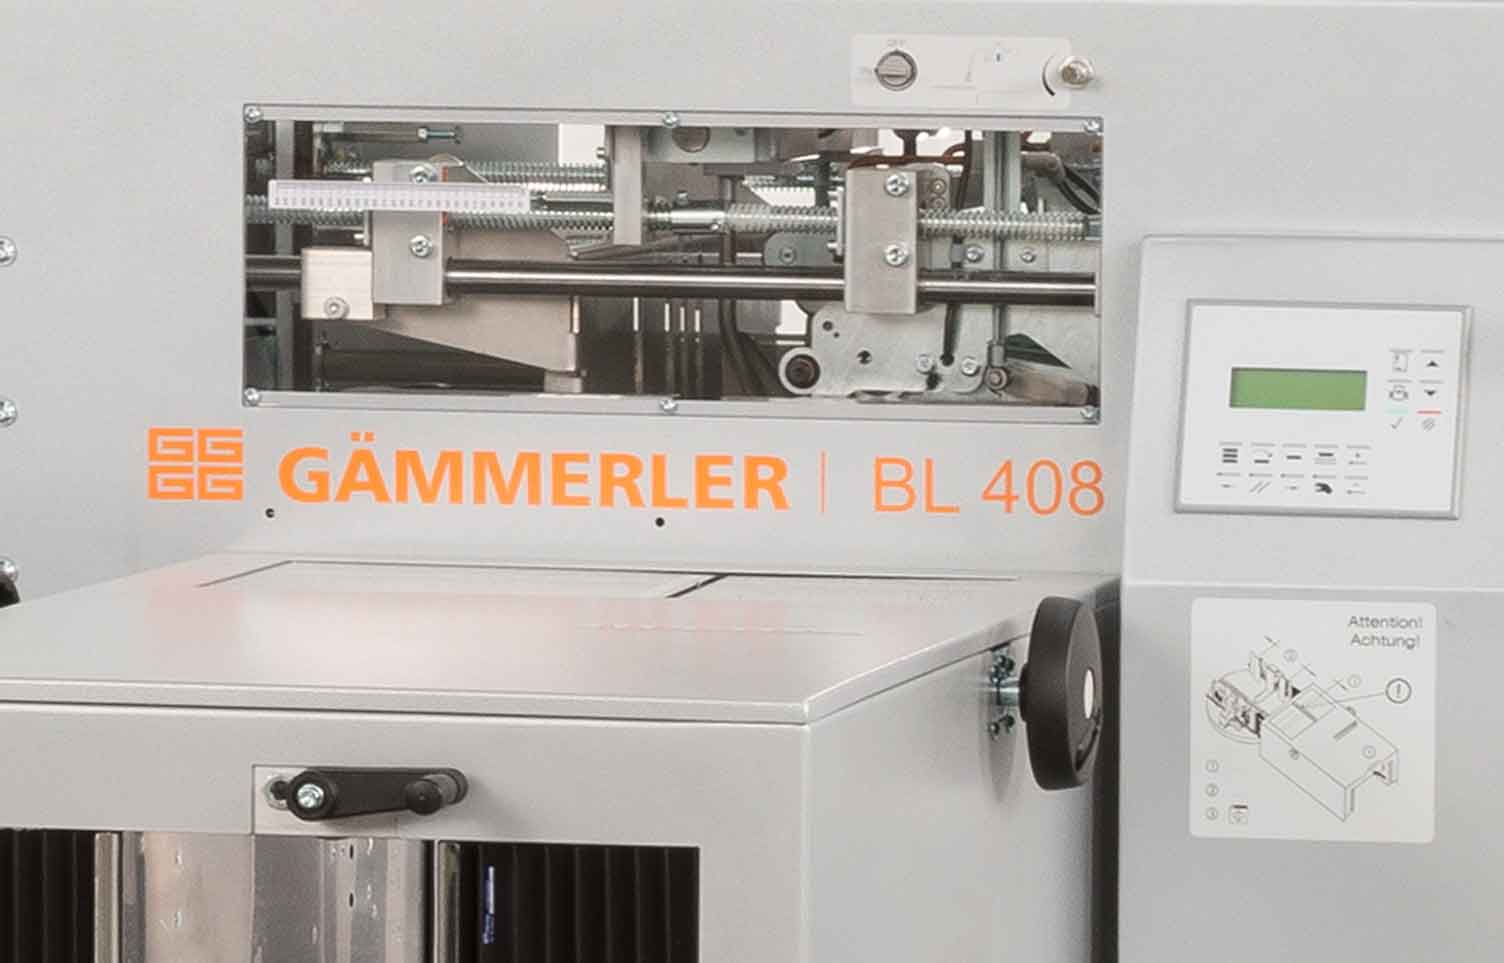 BL408 Buchbinderei-Kreuzleger Gaemmerler